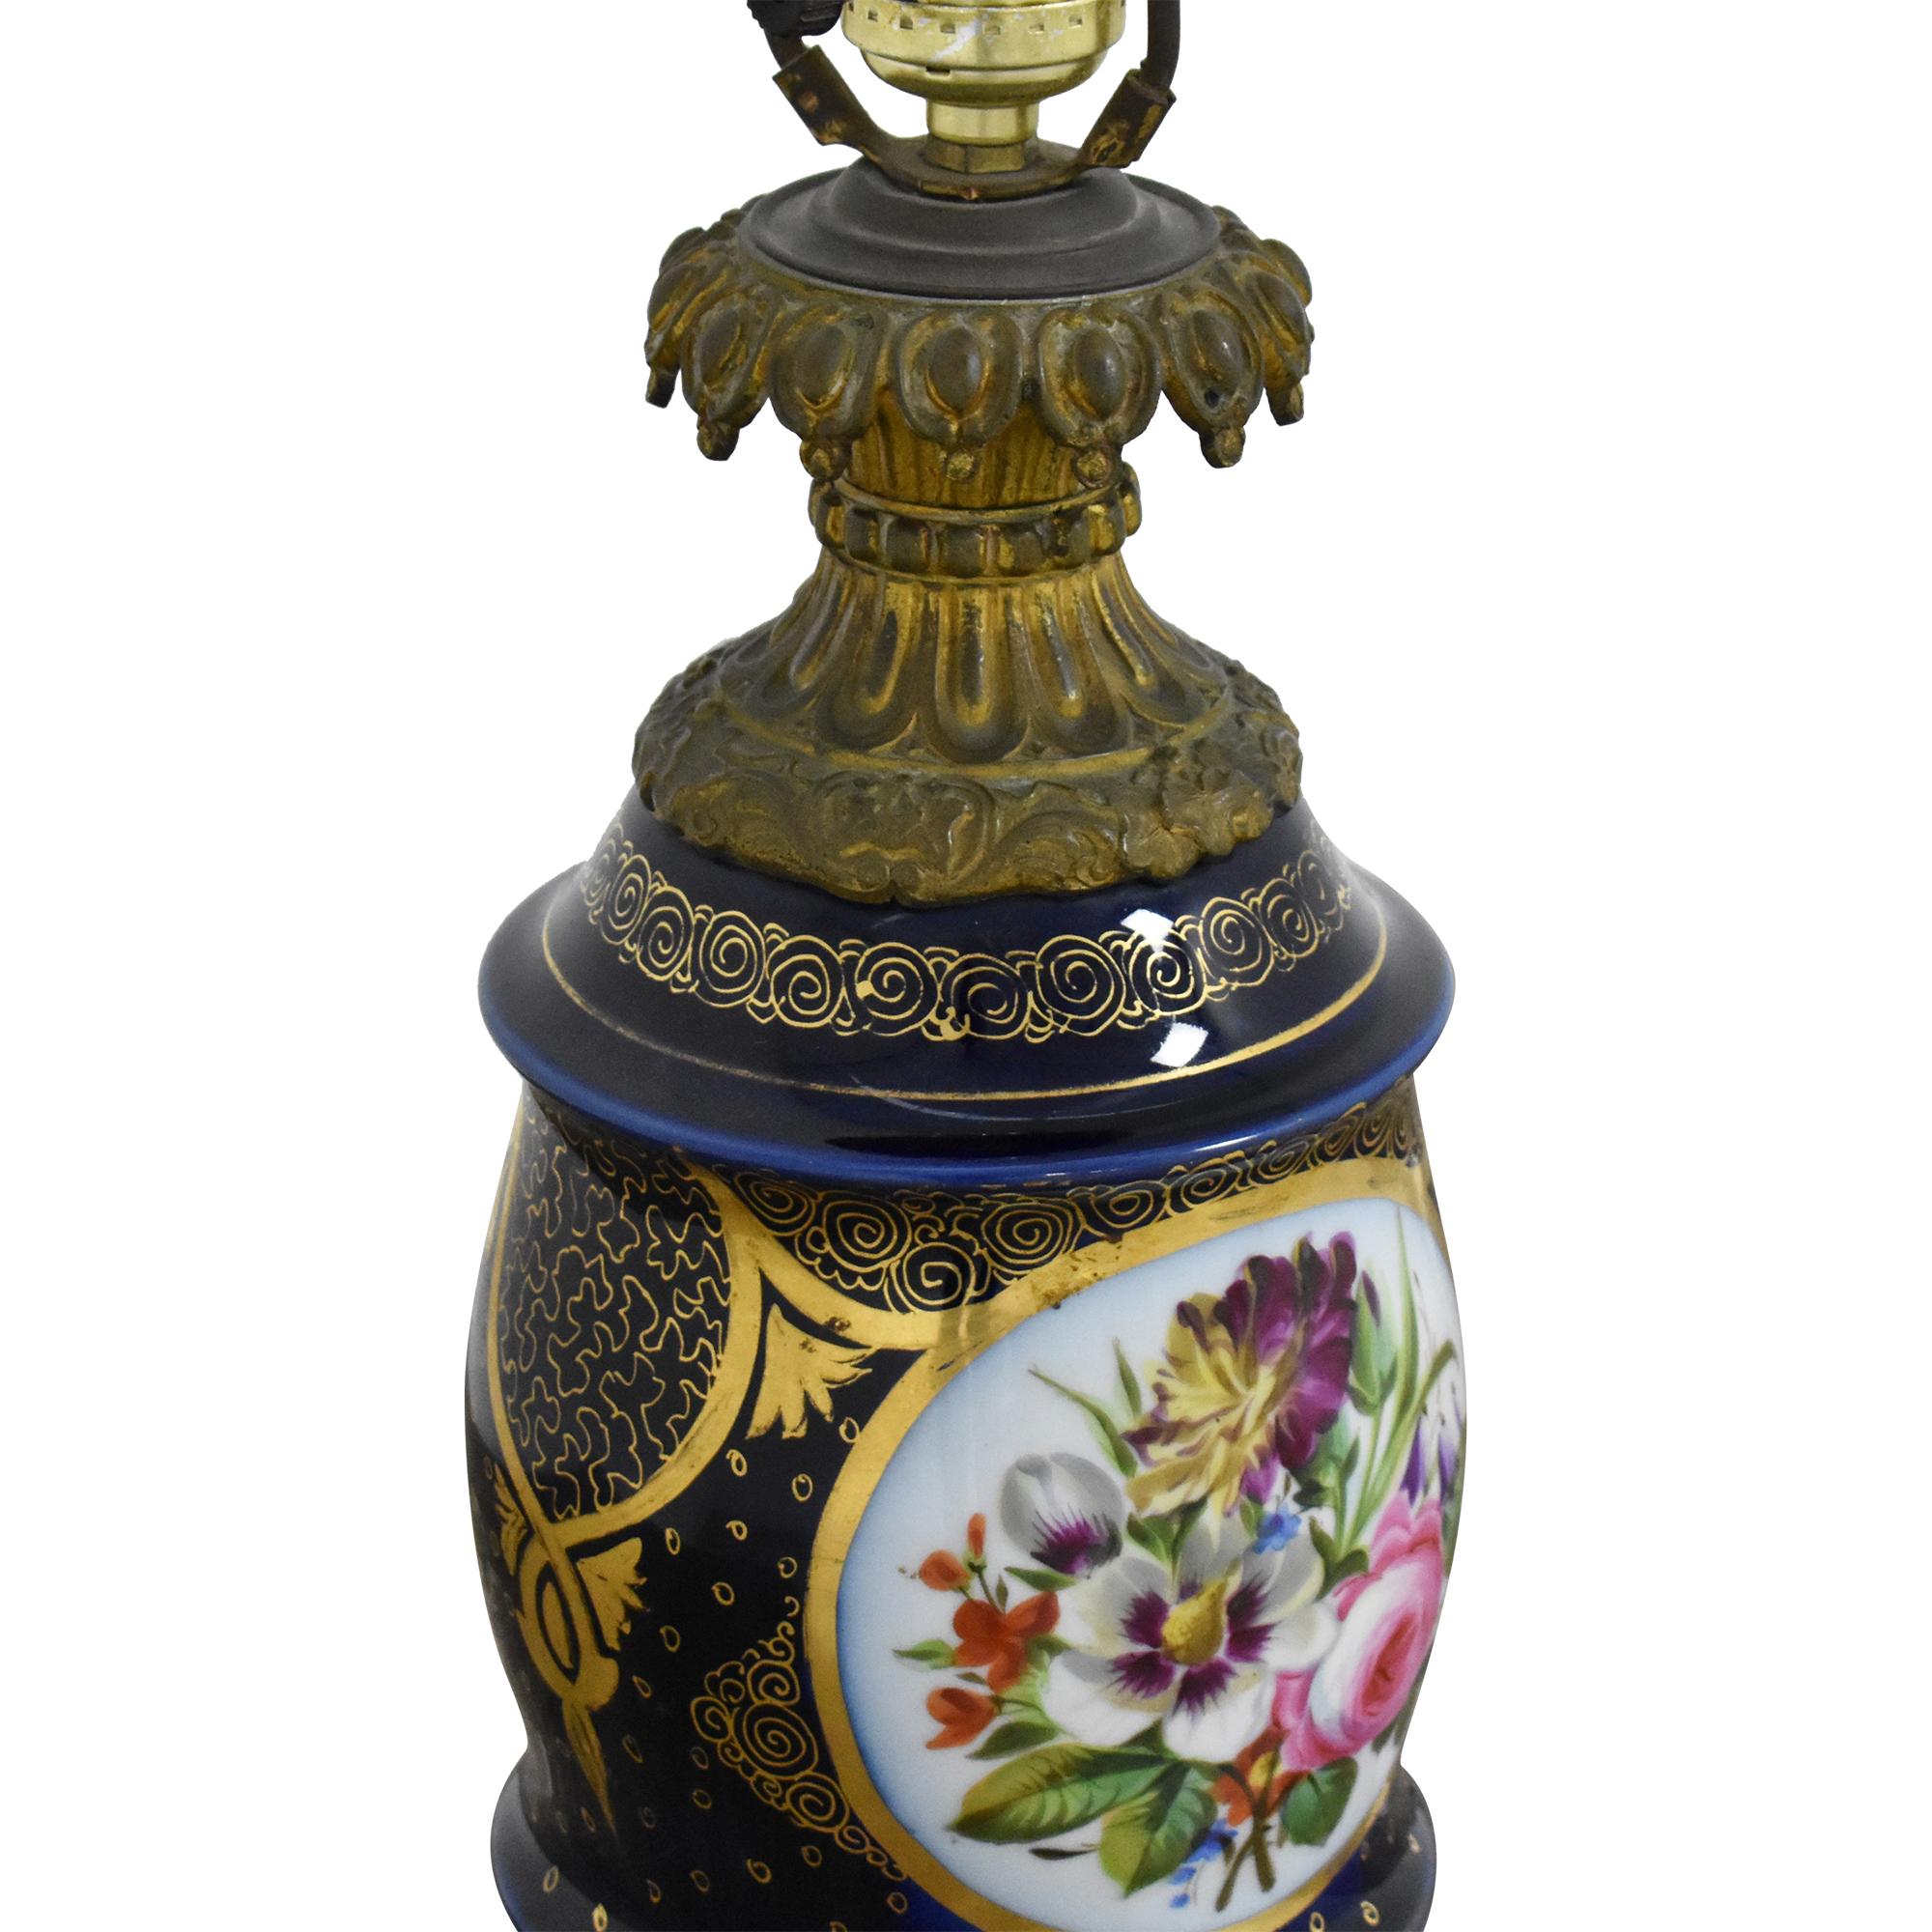 Antique Floral Table Lamp ct